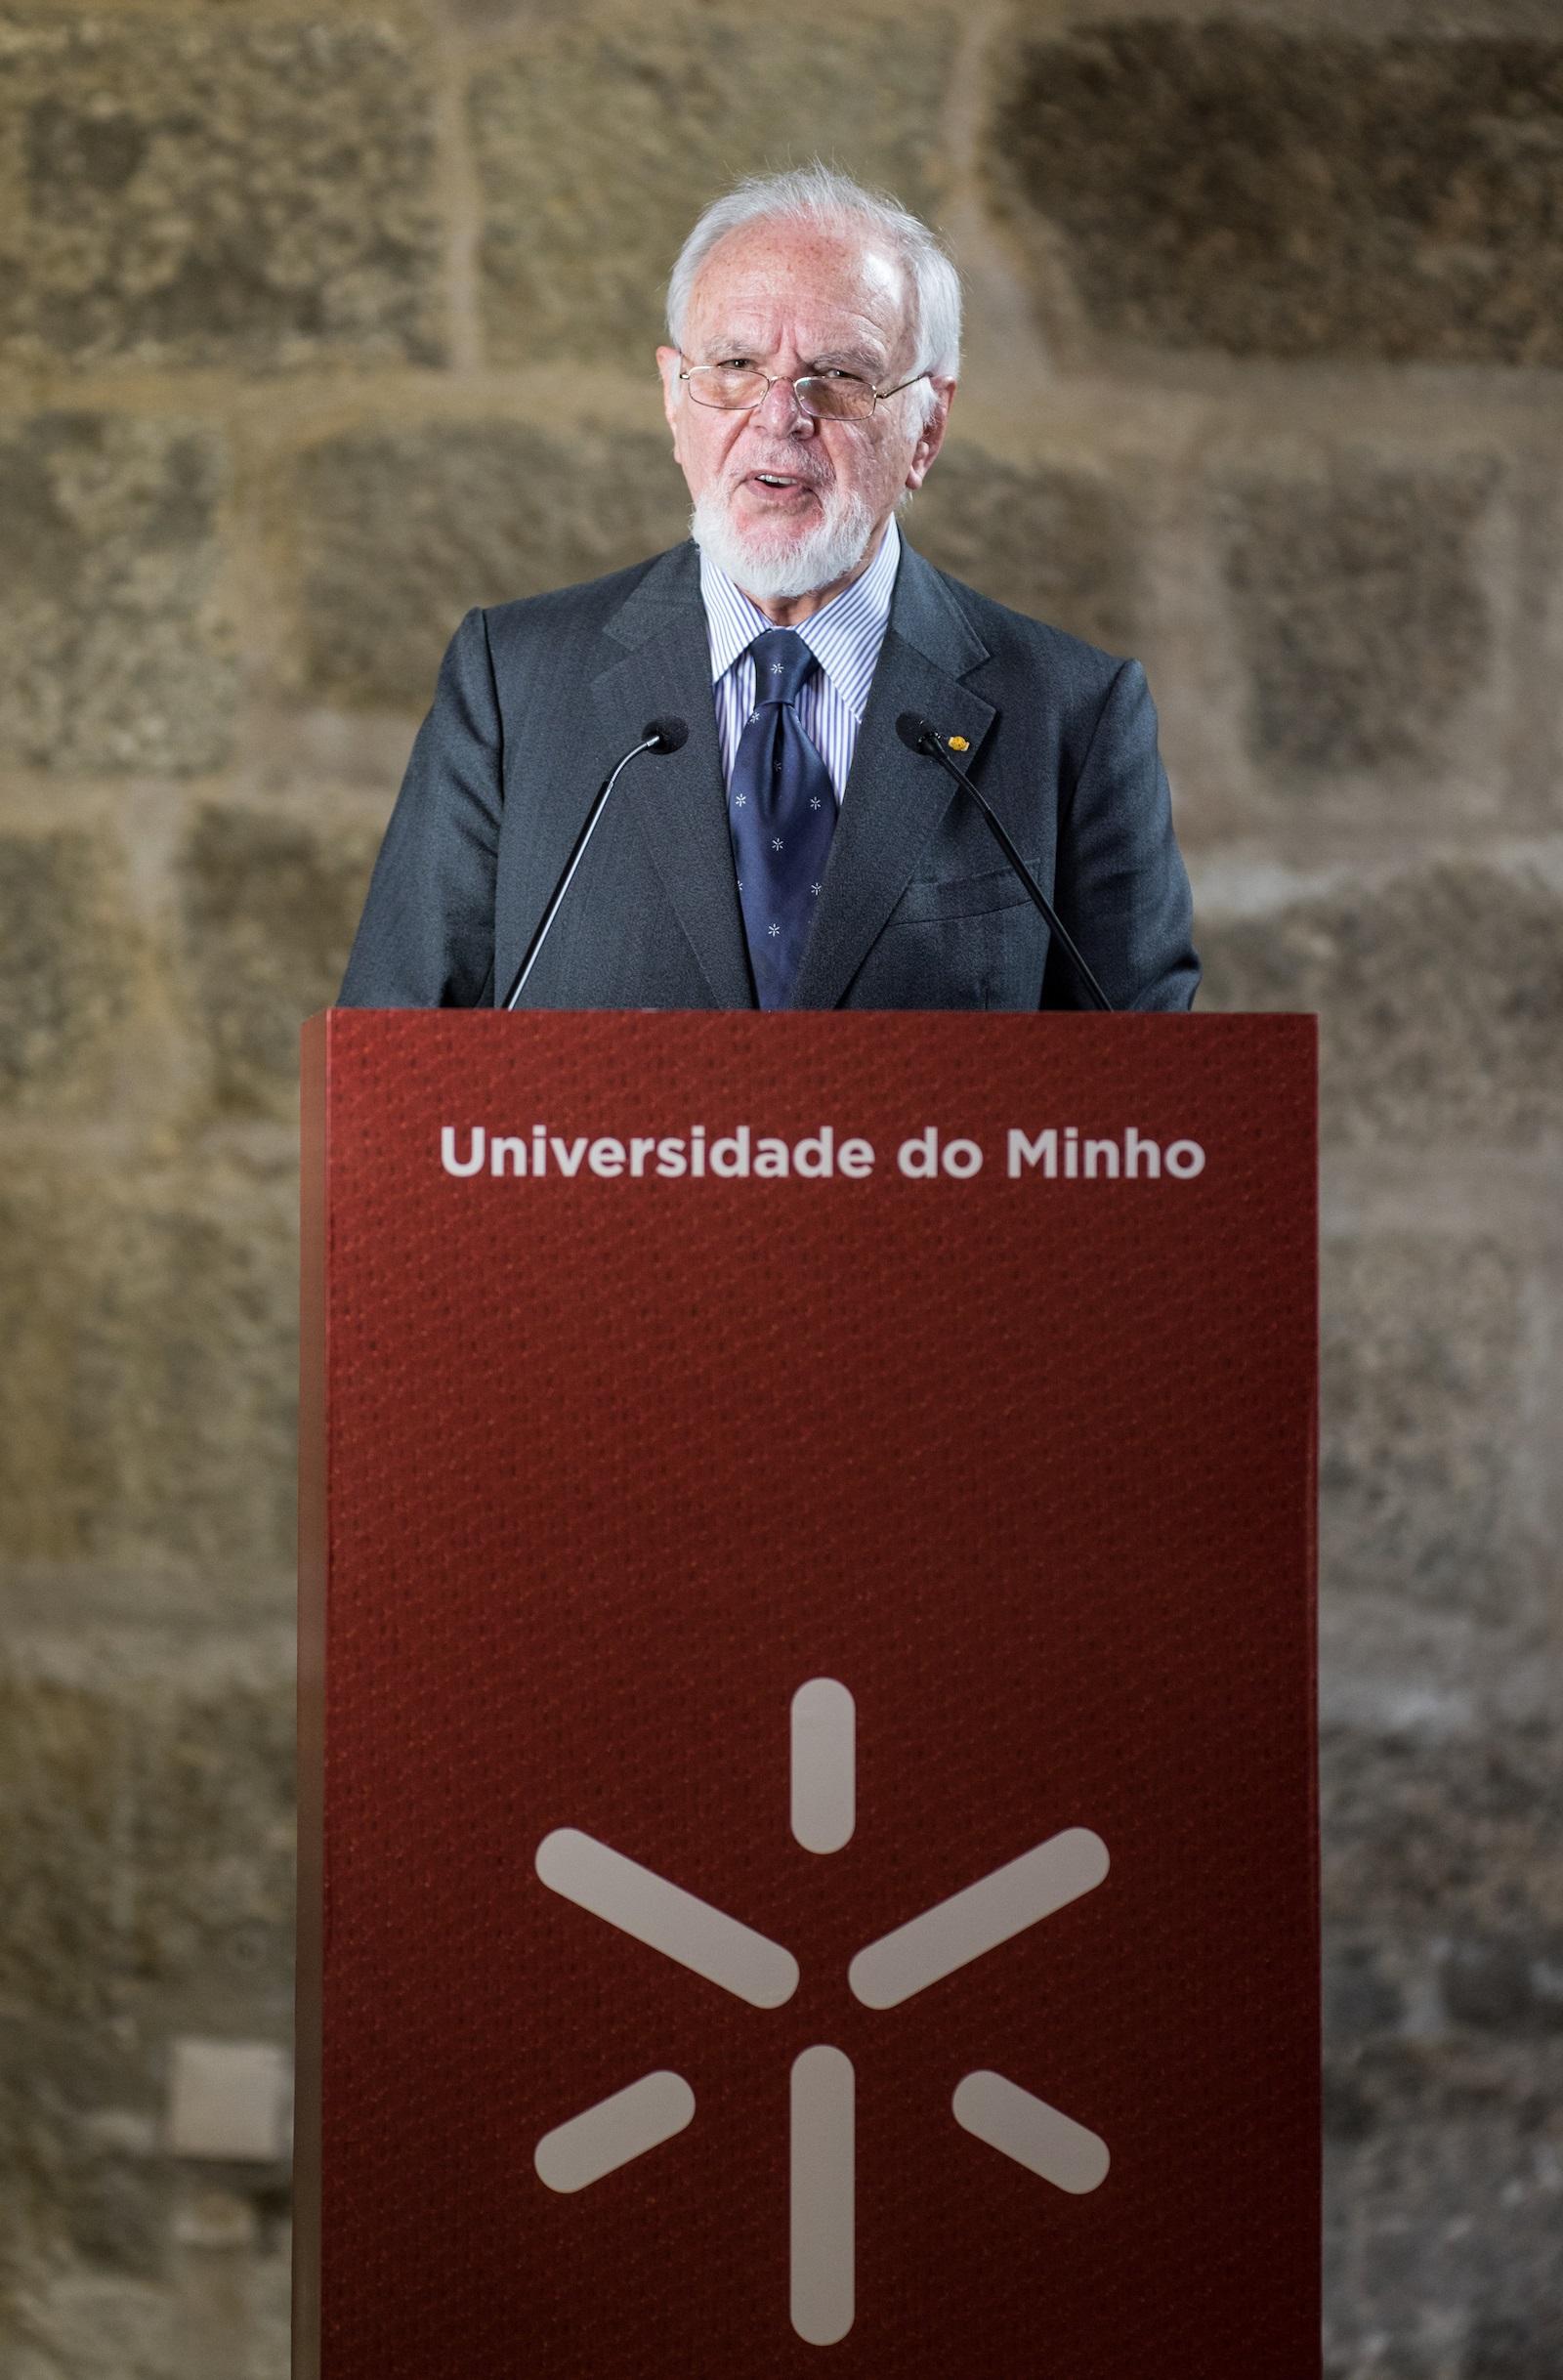 Foto: Nuno Gonçalves